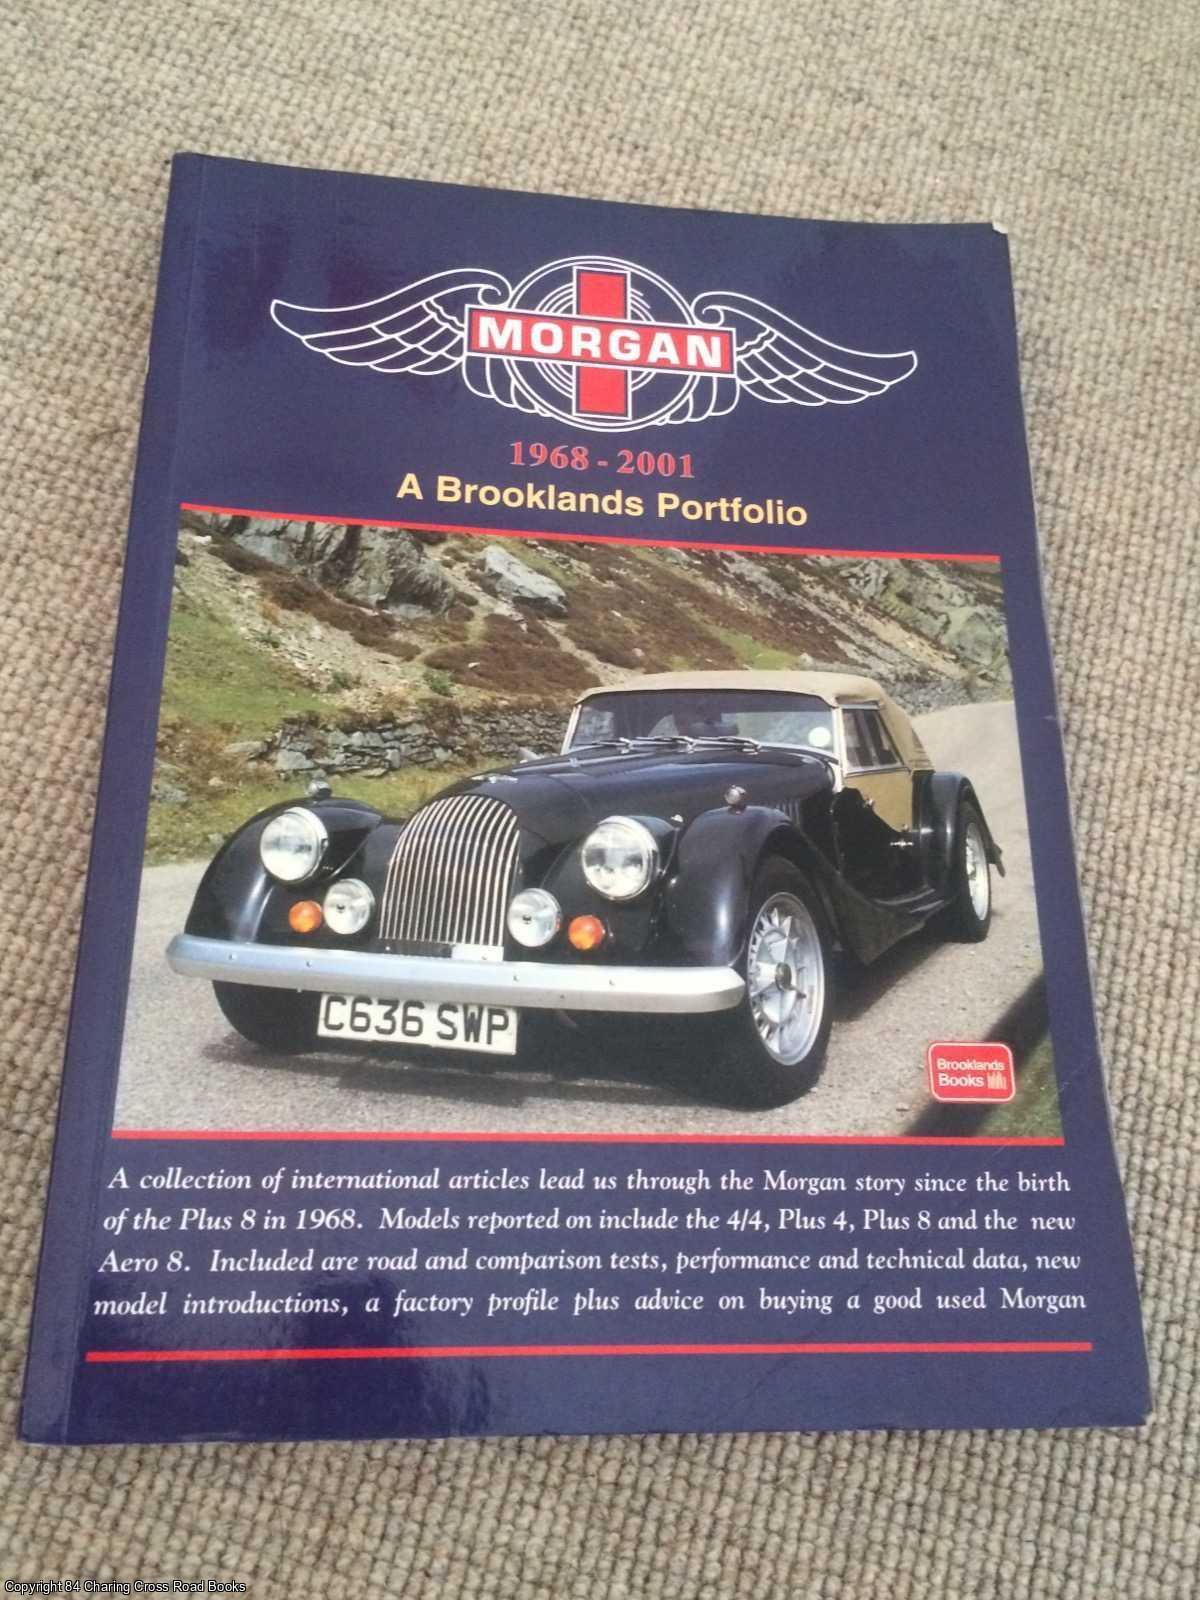 R. M. CLARKE - Morgan 1968 - 2001: A Brooklands Portfolio